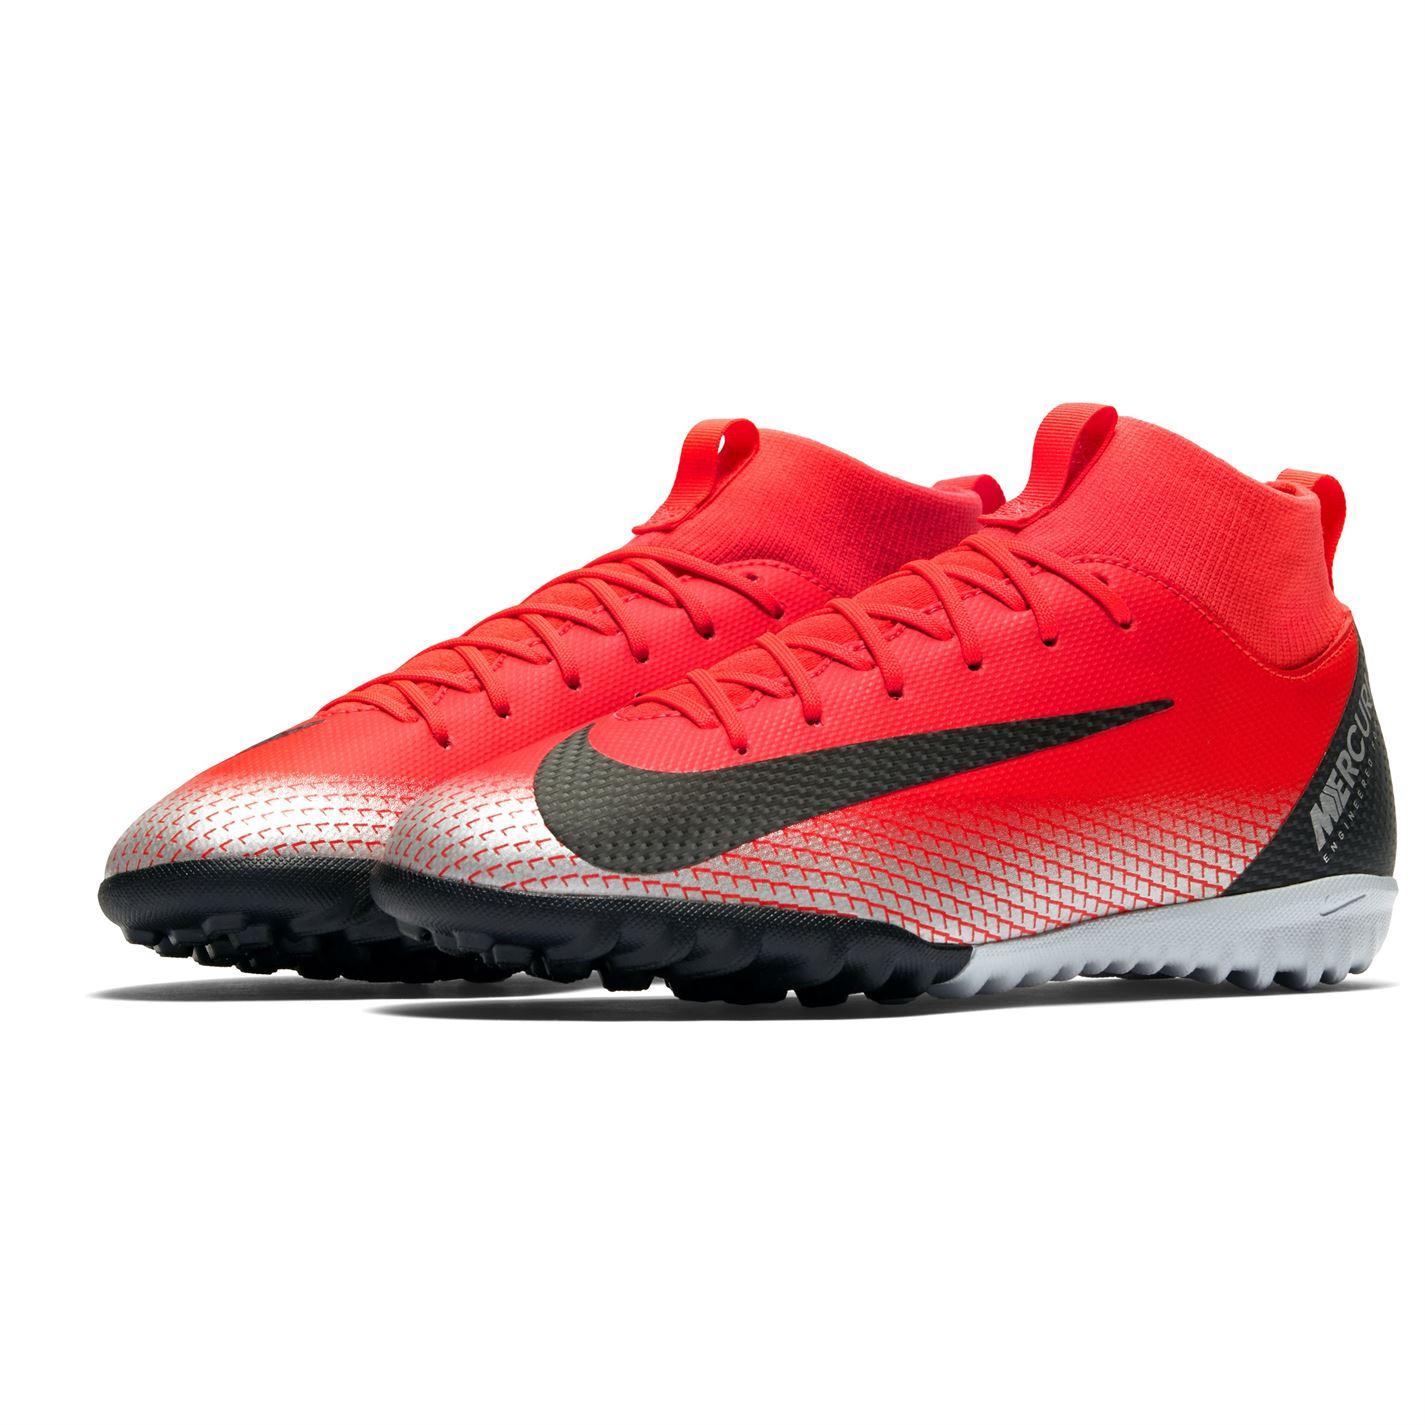 Nike Mercurial Superfly Academy CR7 DF Junior FG Football Boots